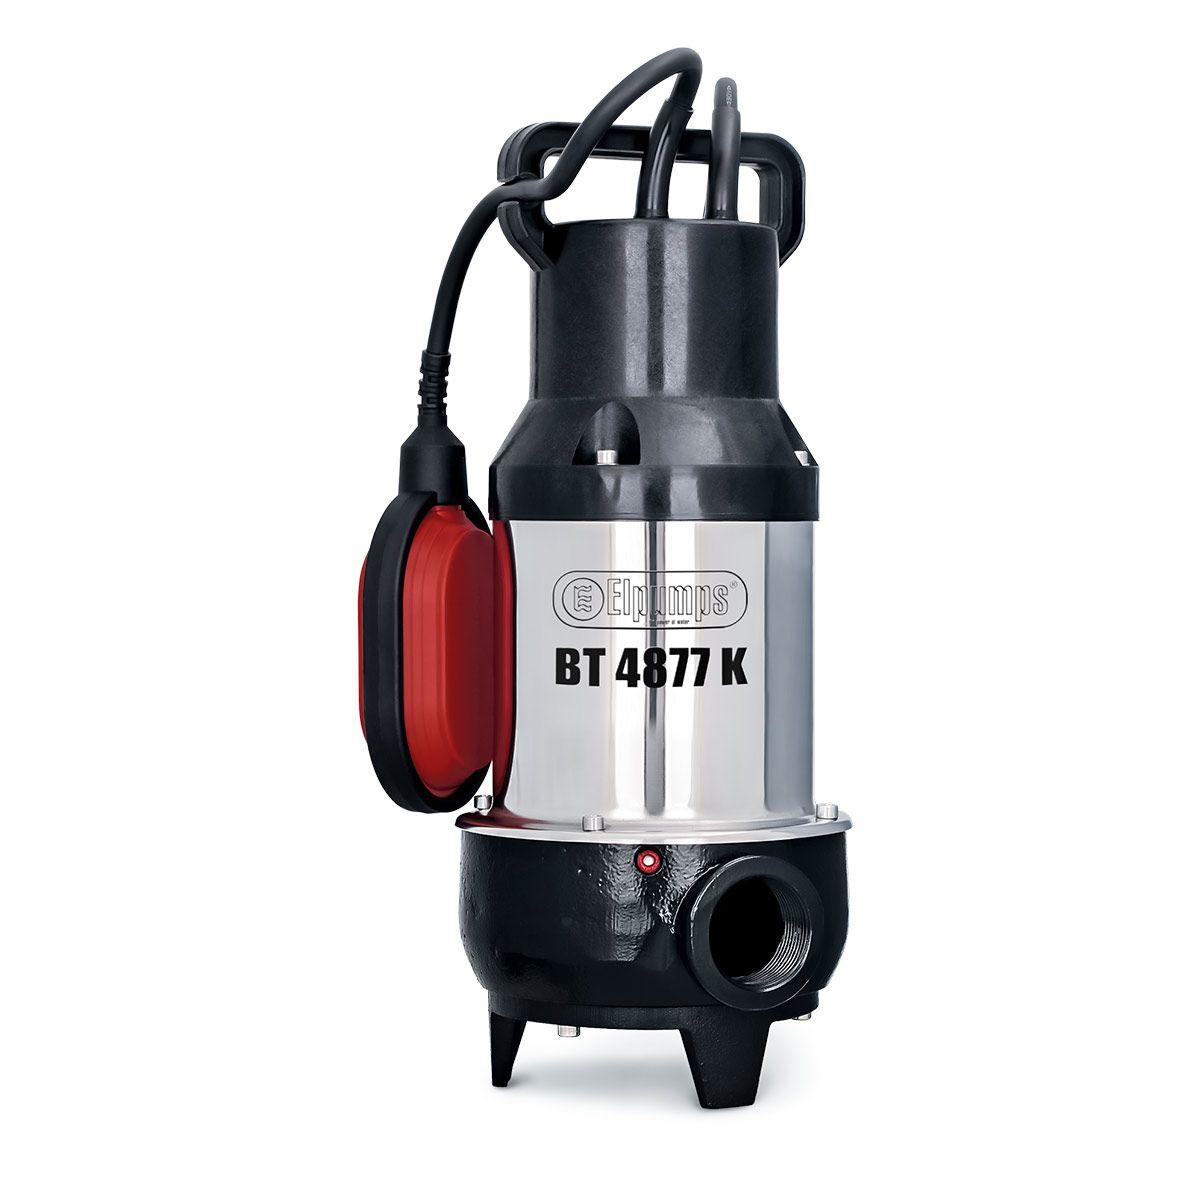 Fäkalienpumpe BT 4877 K, H max 10.0 m, Q max 20000 l/h, 0.9 kW, 220 x 190 x 450 mm, 1 1/4' IG, 230 V